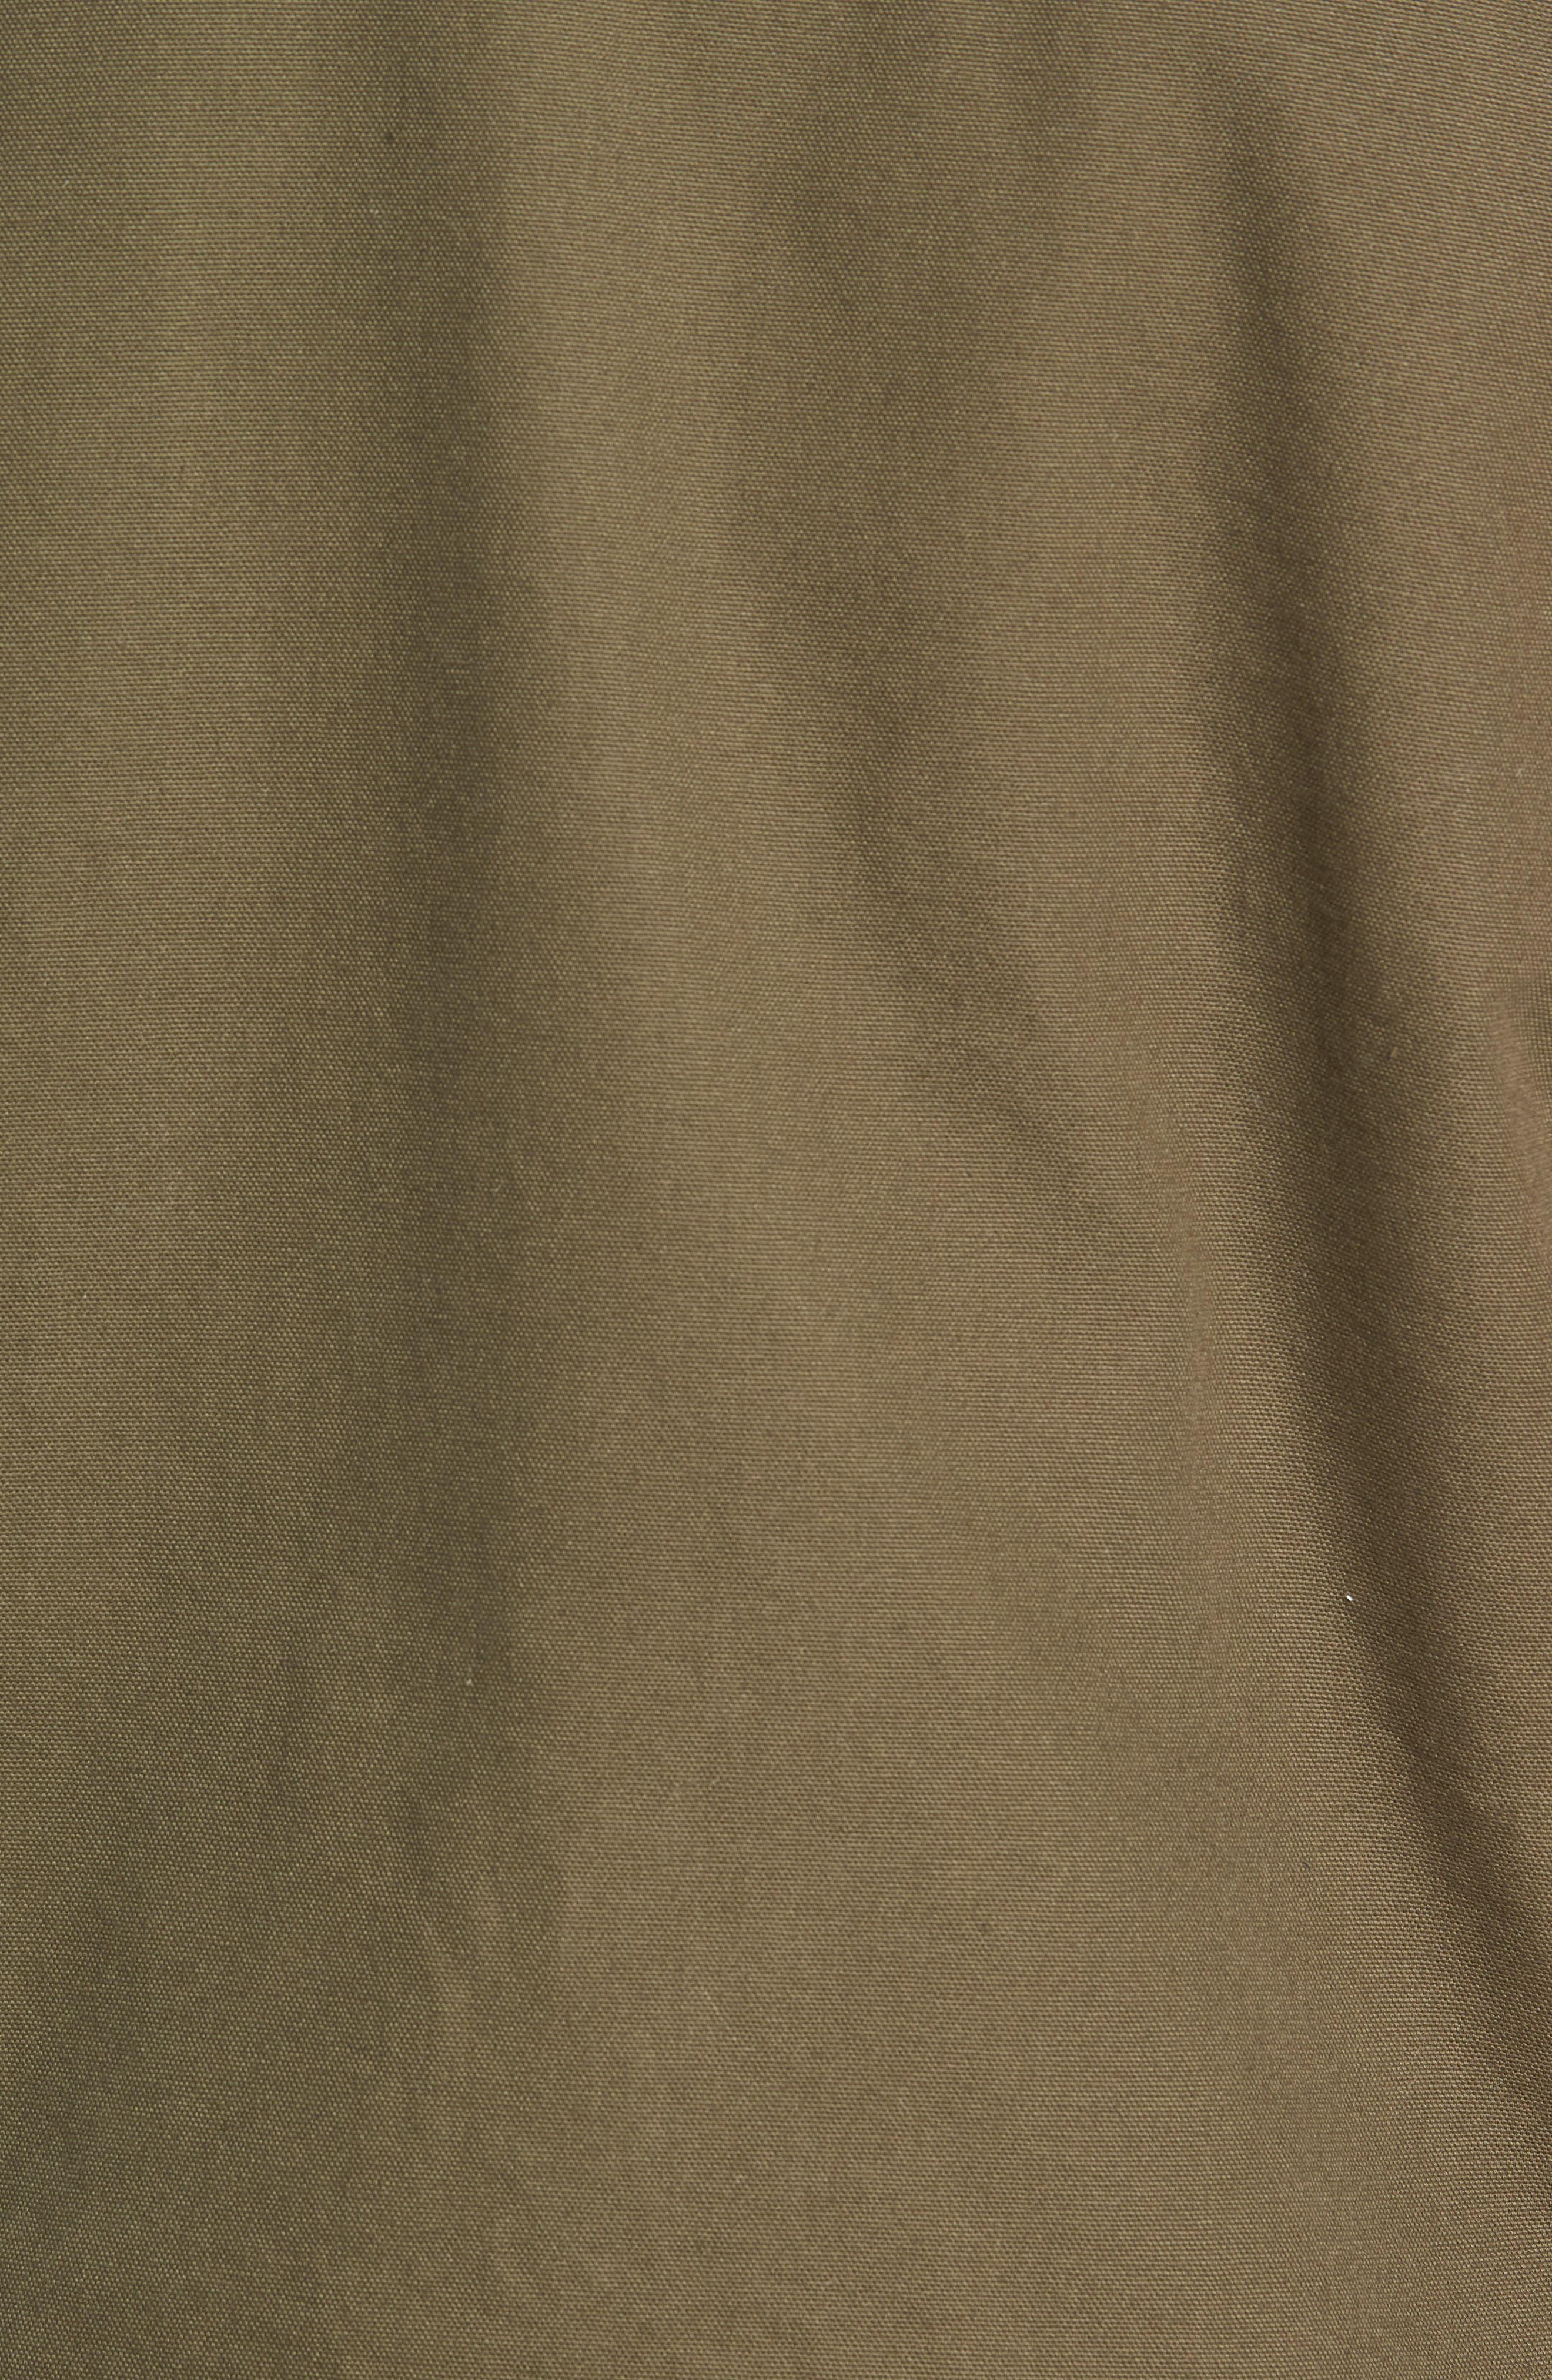 Alamitos Canvas Work Jacket,                             Alternate thumbnail 7, color,                             GRAPE LEAF